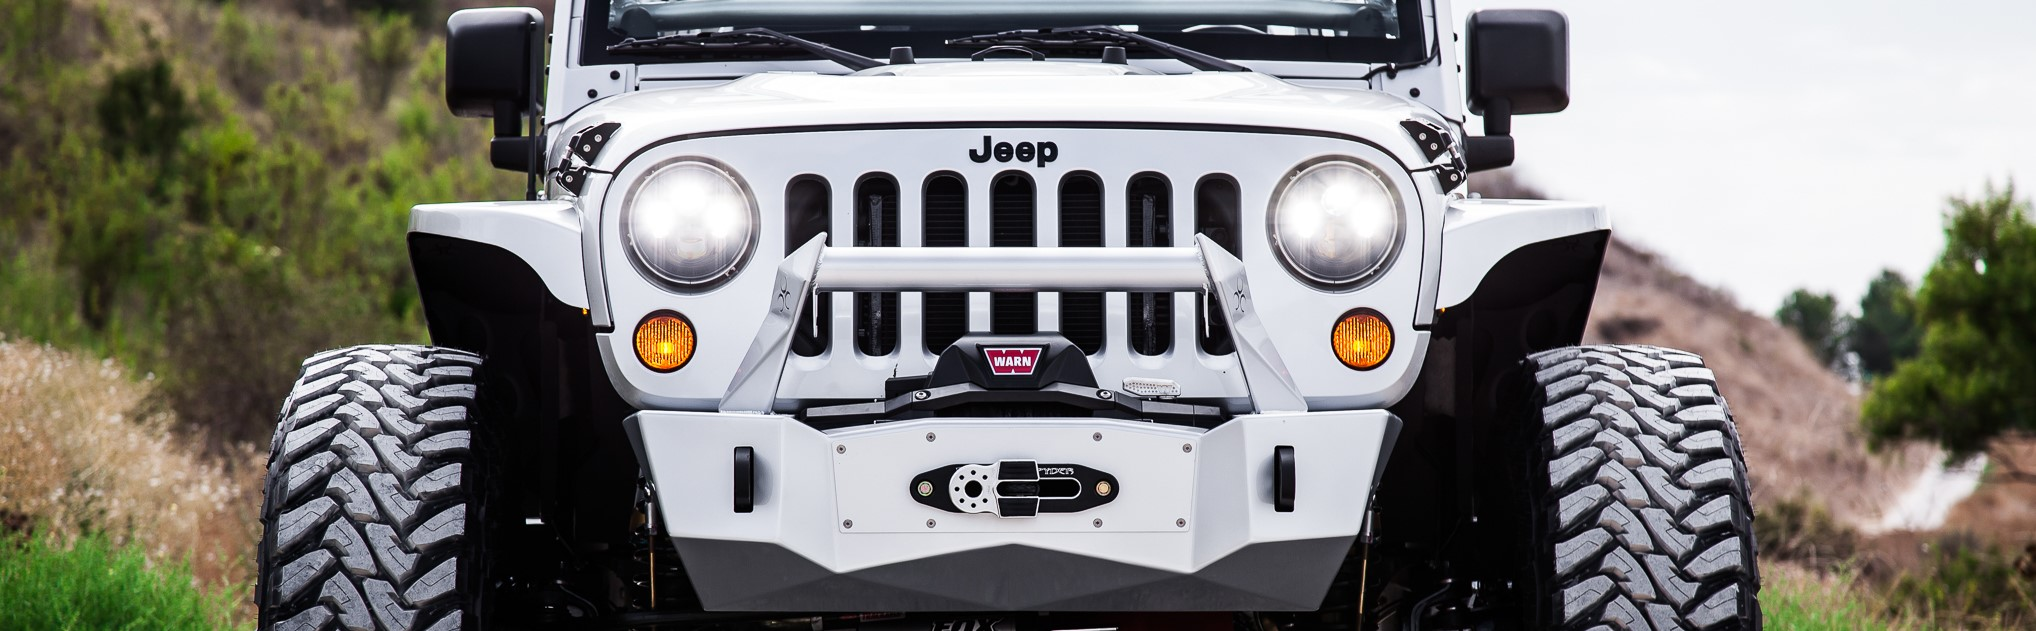 Jeep Wrangler JK & JKU